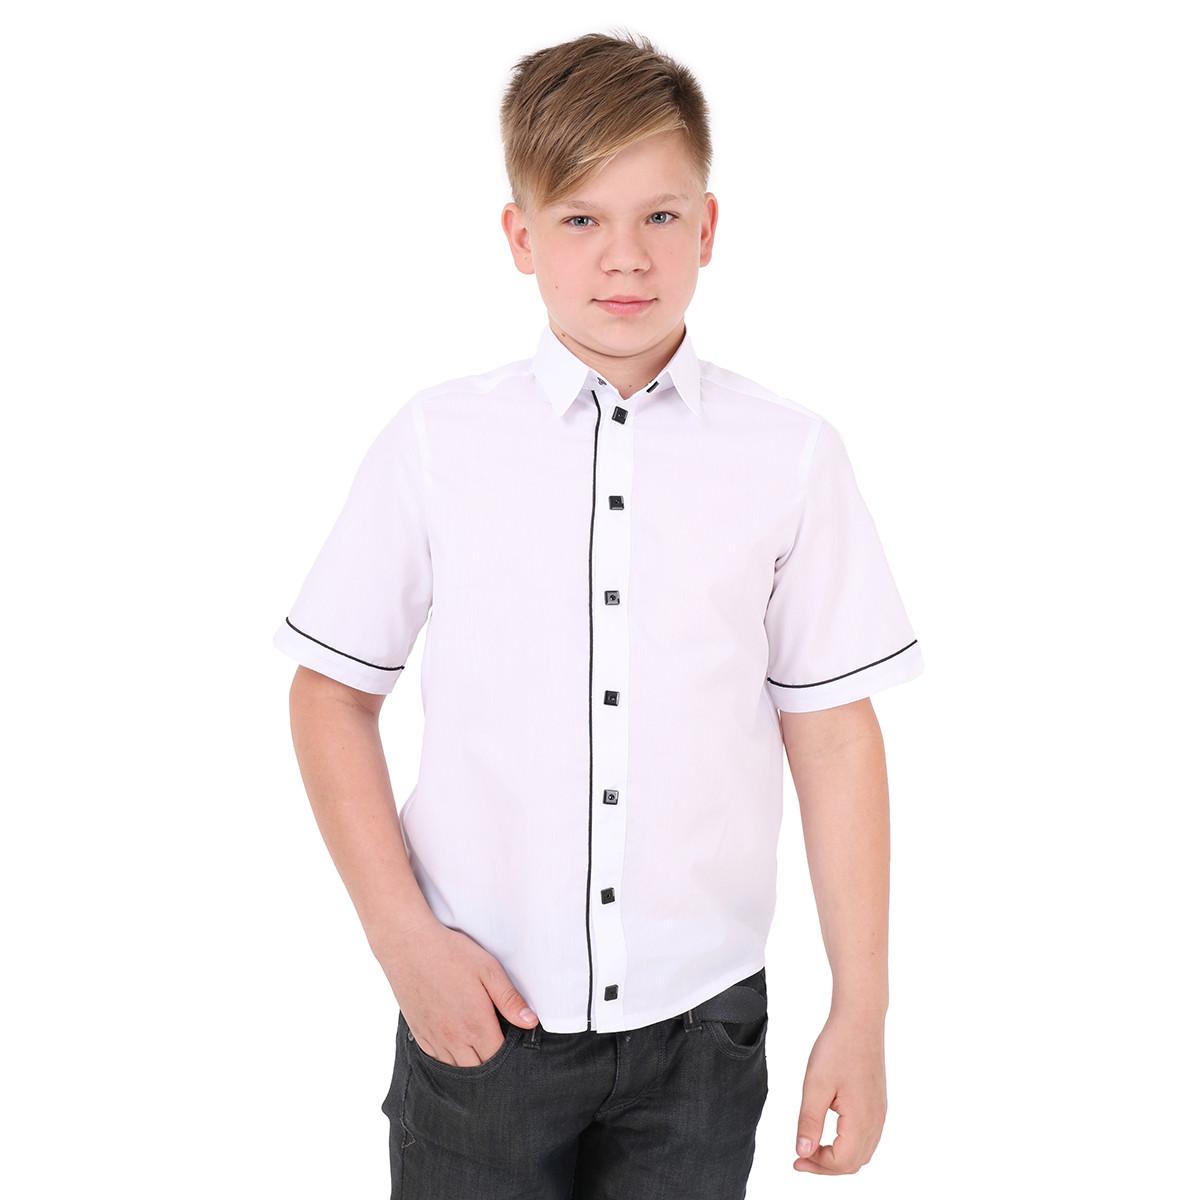 Рубашка для мальчика KEVIN с коротким рукавом